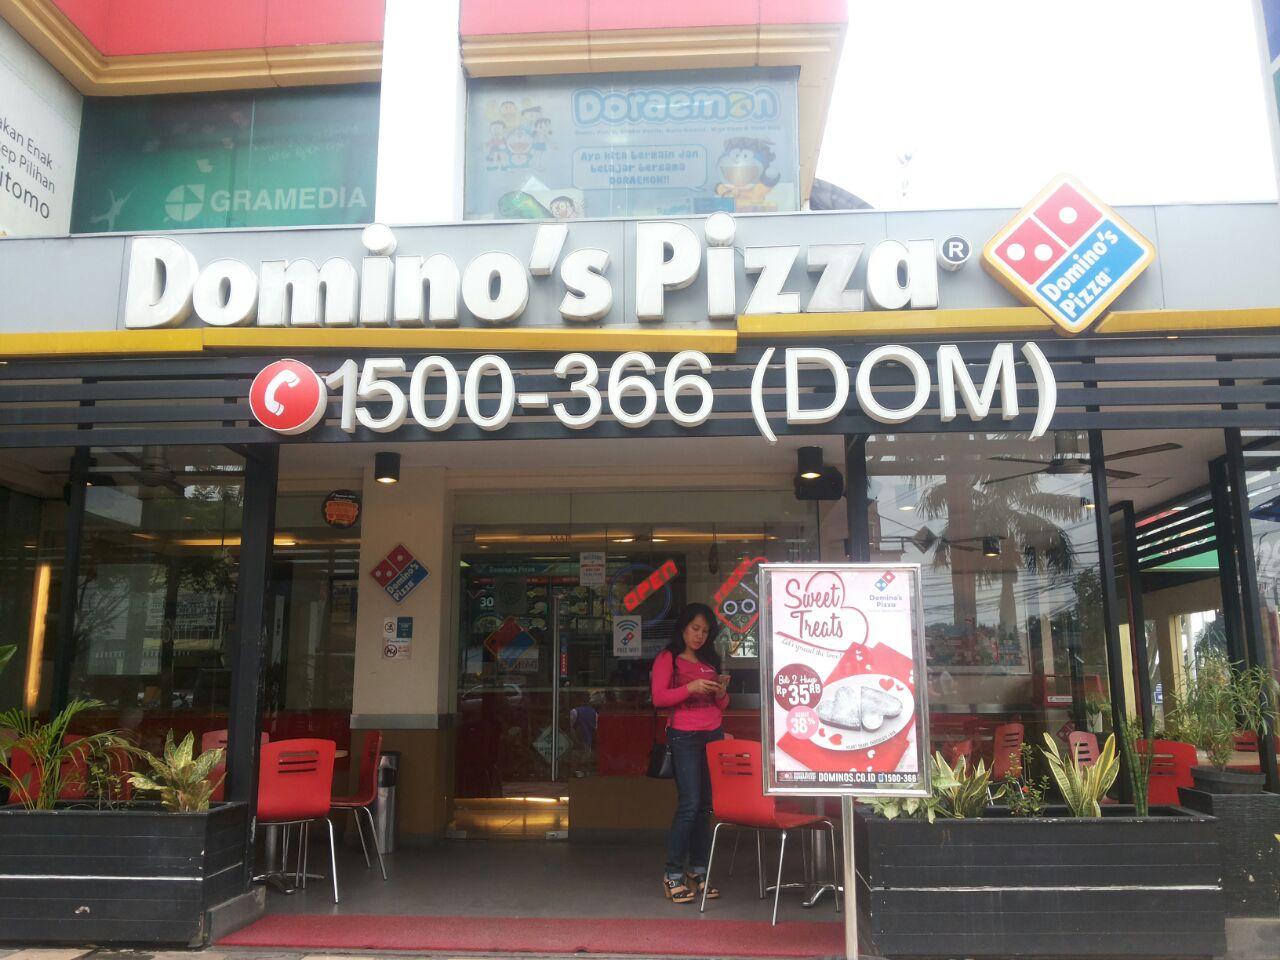 Domino's Pizza - Pangkalan Jati Limo, Depok